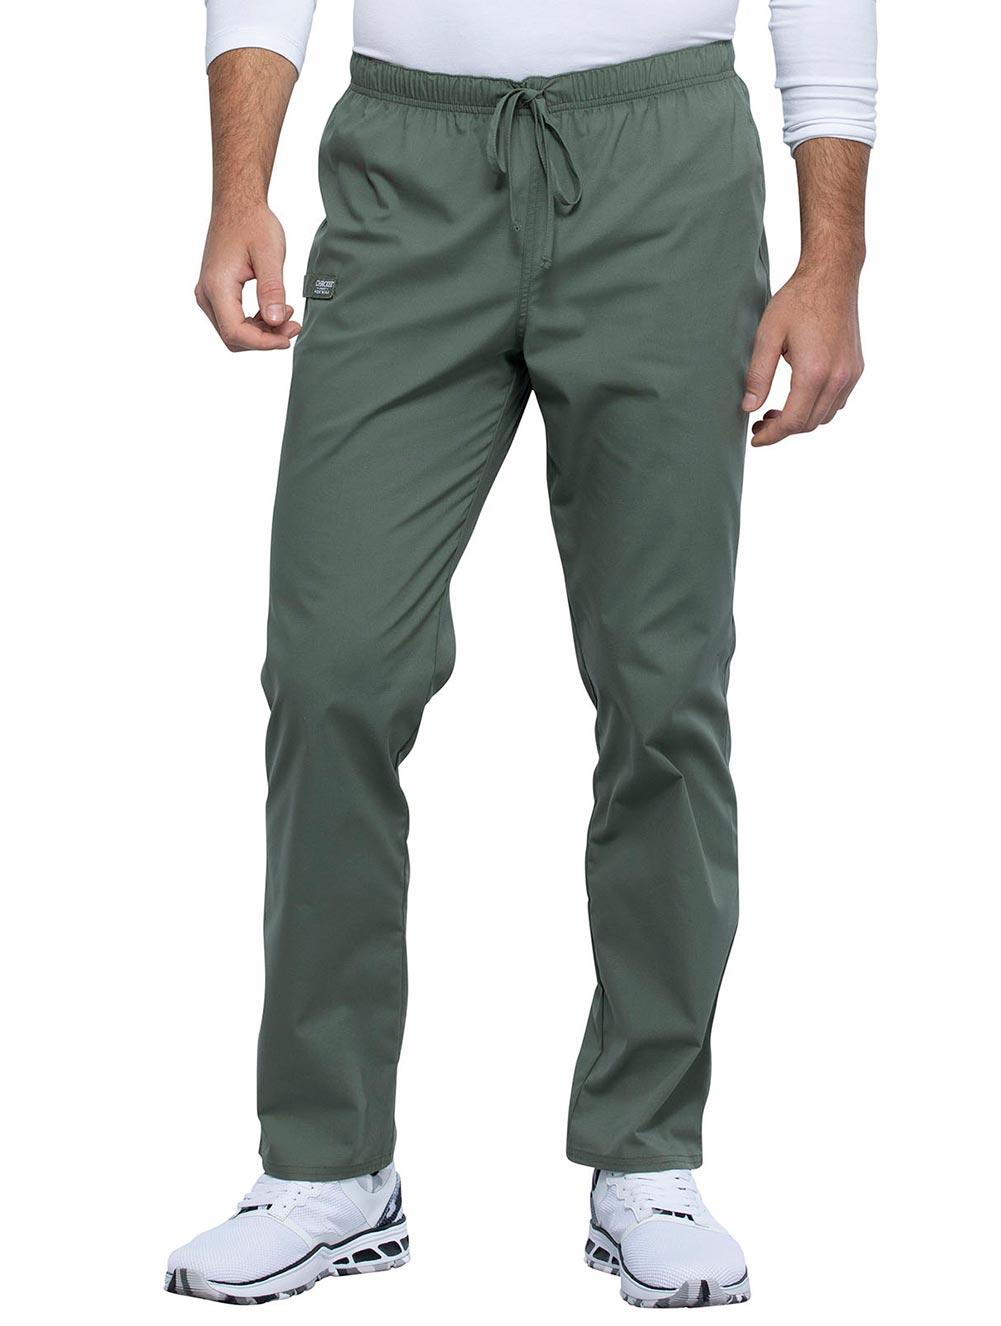 Unisex Pocketless Drawstring Pant